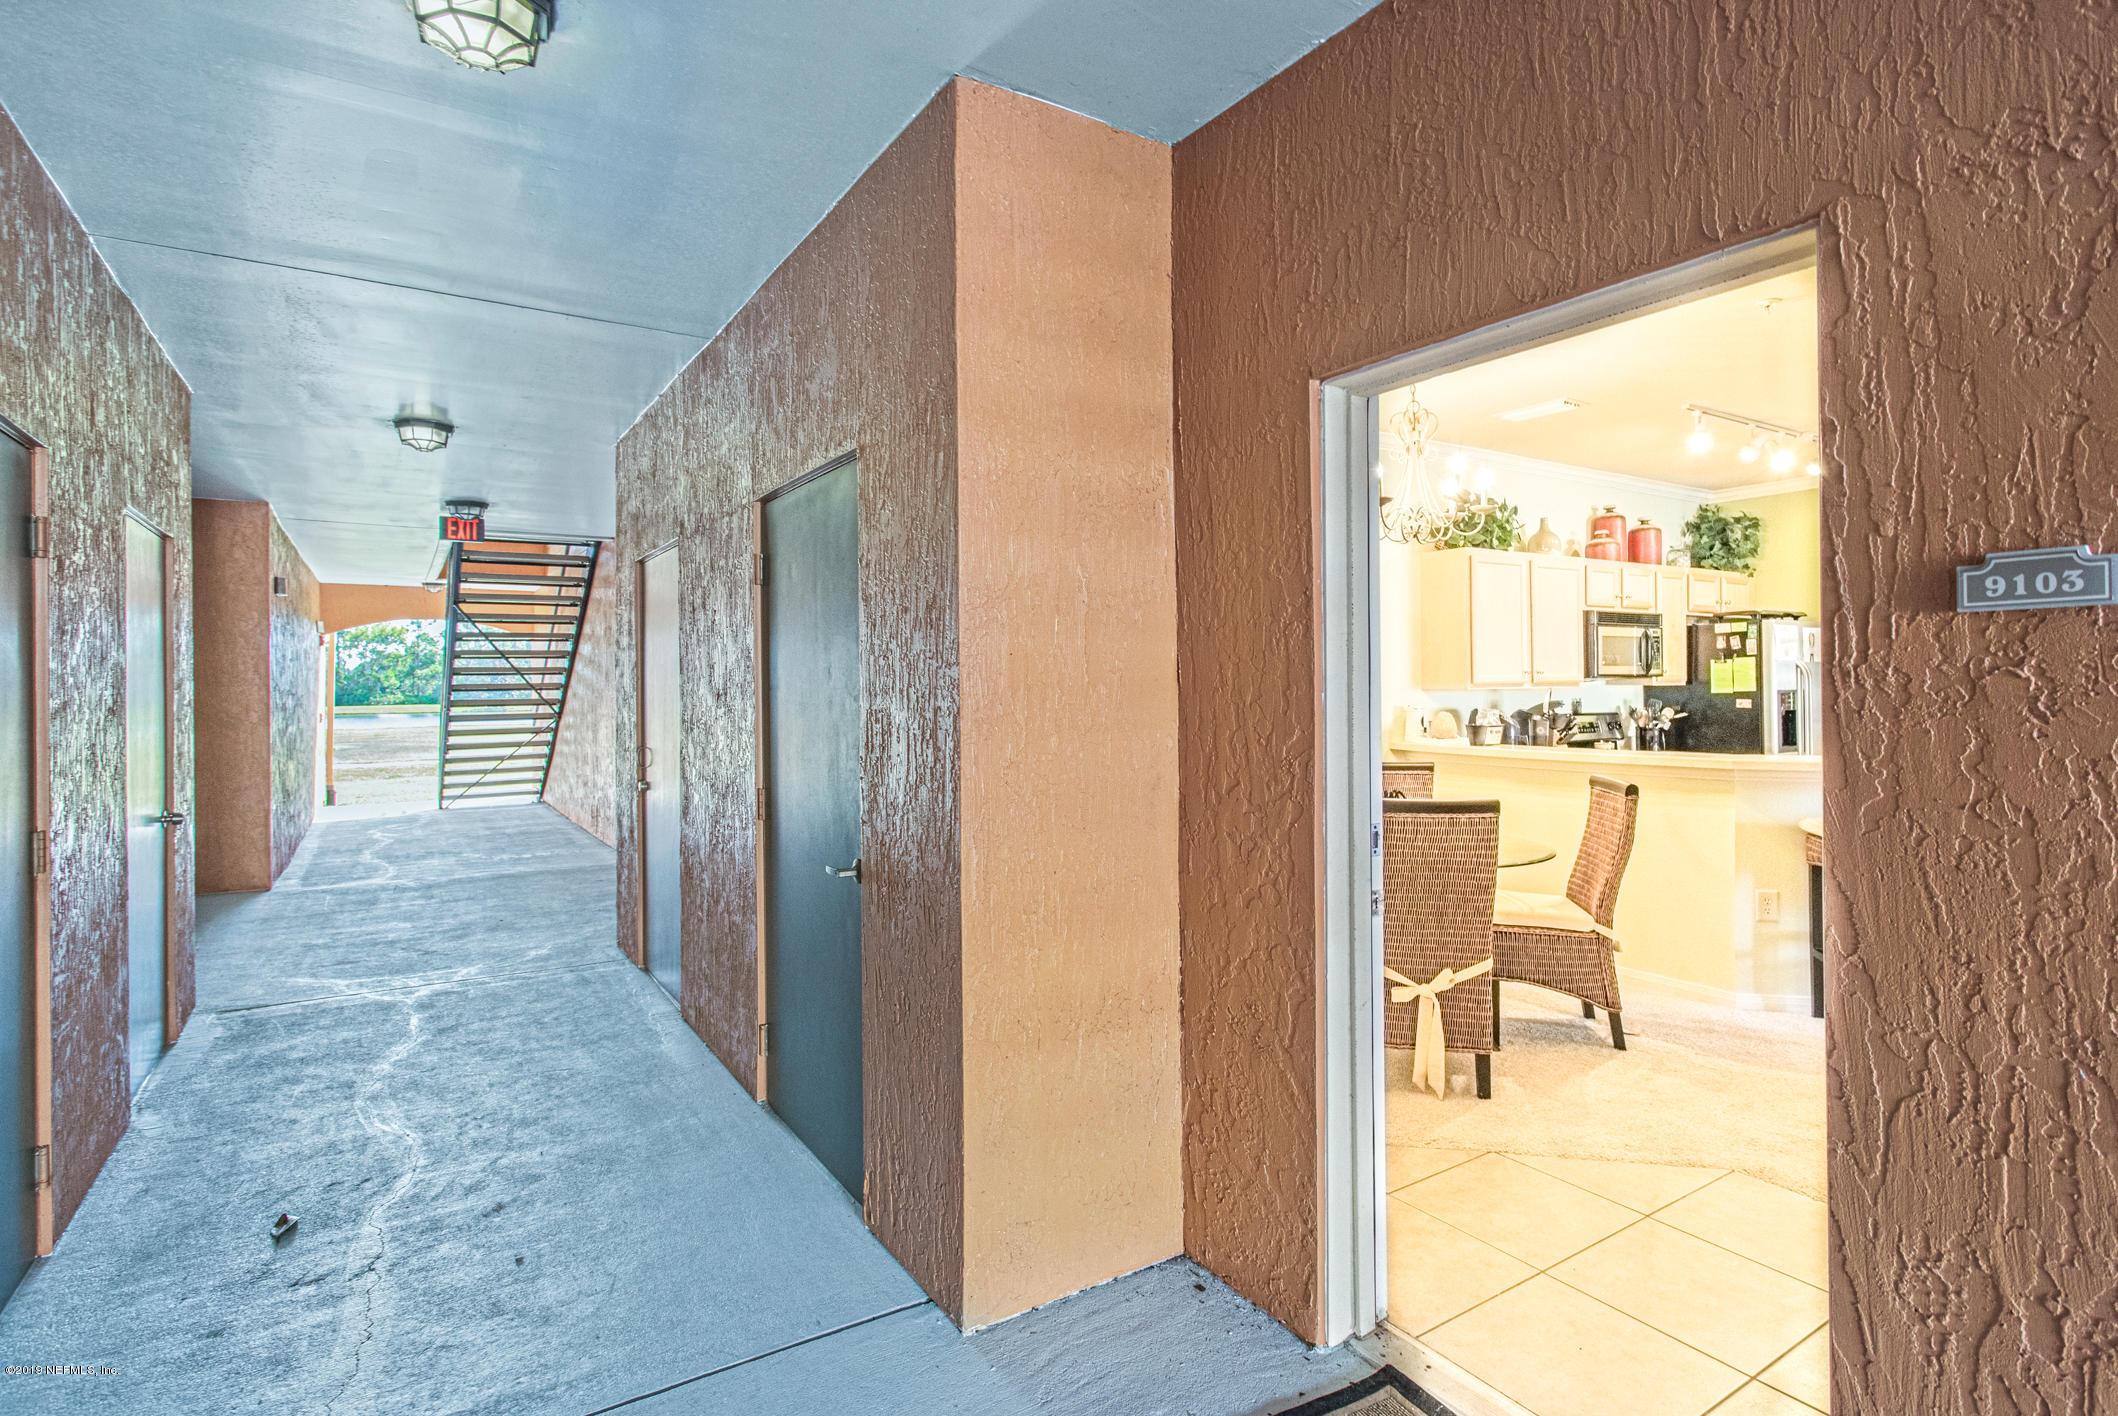 255 OLD VILLAGE CENTER- ST AUGUSTINE- FLORIDA 32084, 2 Bedrooms Bedrooms, ,2 BathroomsBathrooms,Condo,For sale,OLD VILLAGE CENTER,1022401